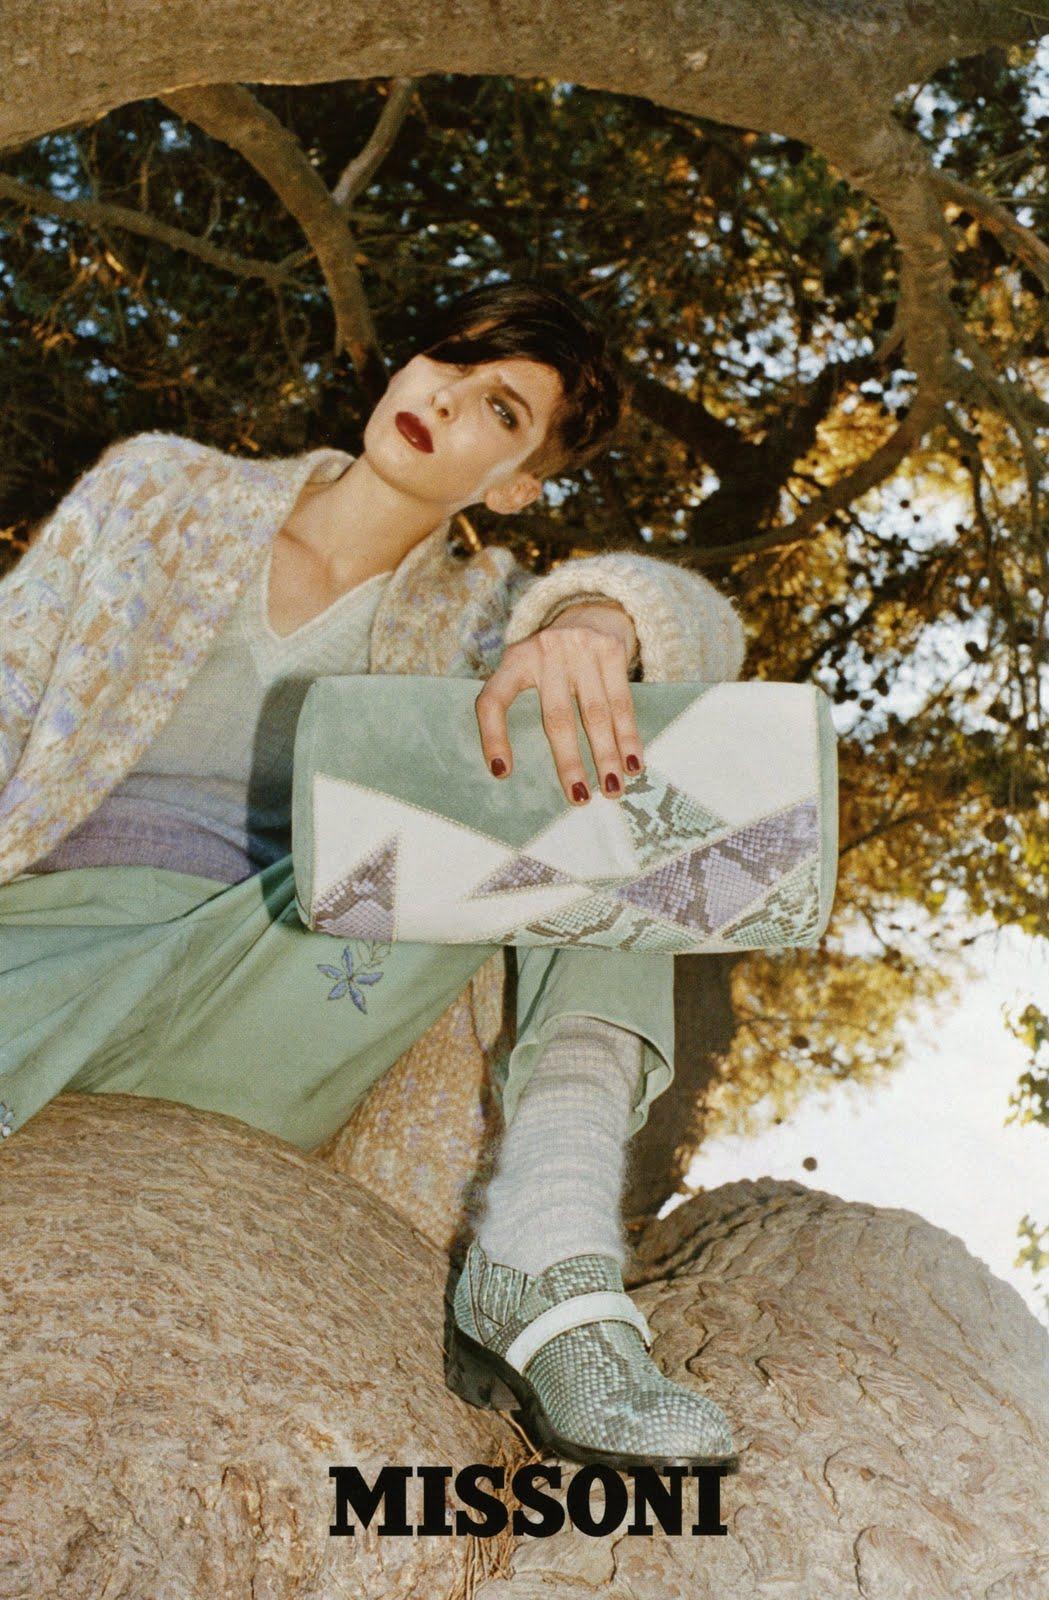 Missoni+fall+2011+campaign+photo+Juergen+Teller+model+Kristina+Salinovic+Women+Management+NYC+Blog